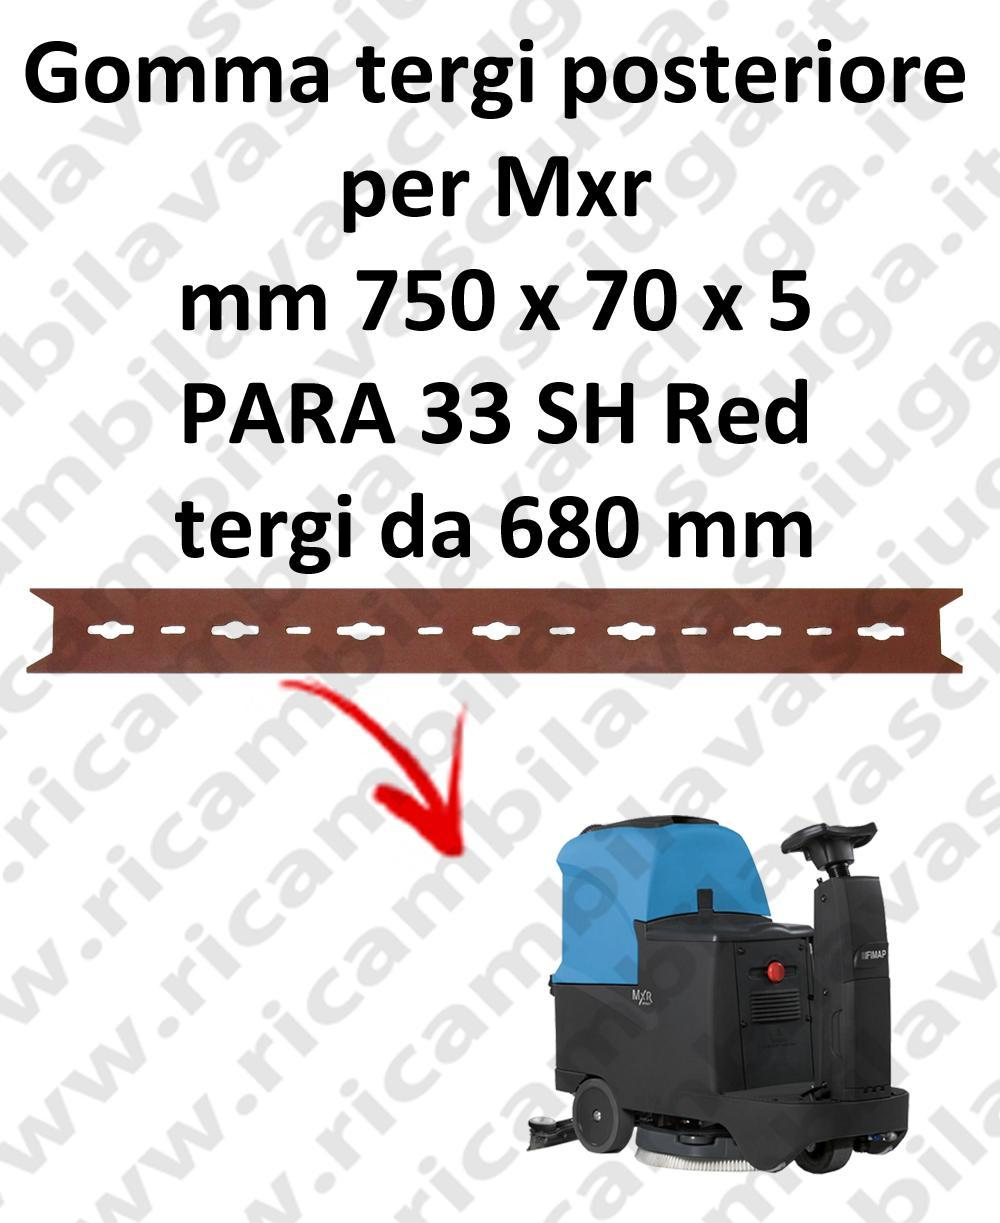 MXR Hinten Sauglippen für scheuersaugmaschinen FIMAP